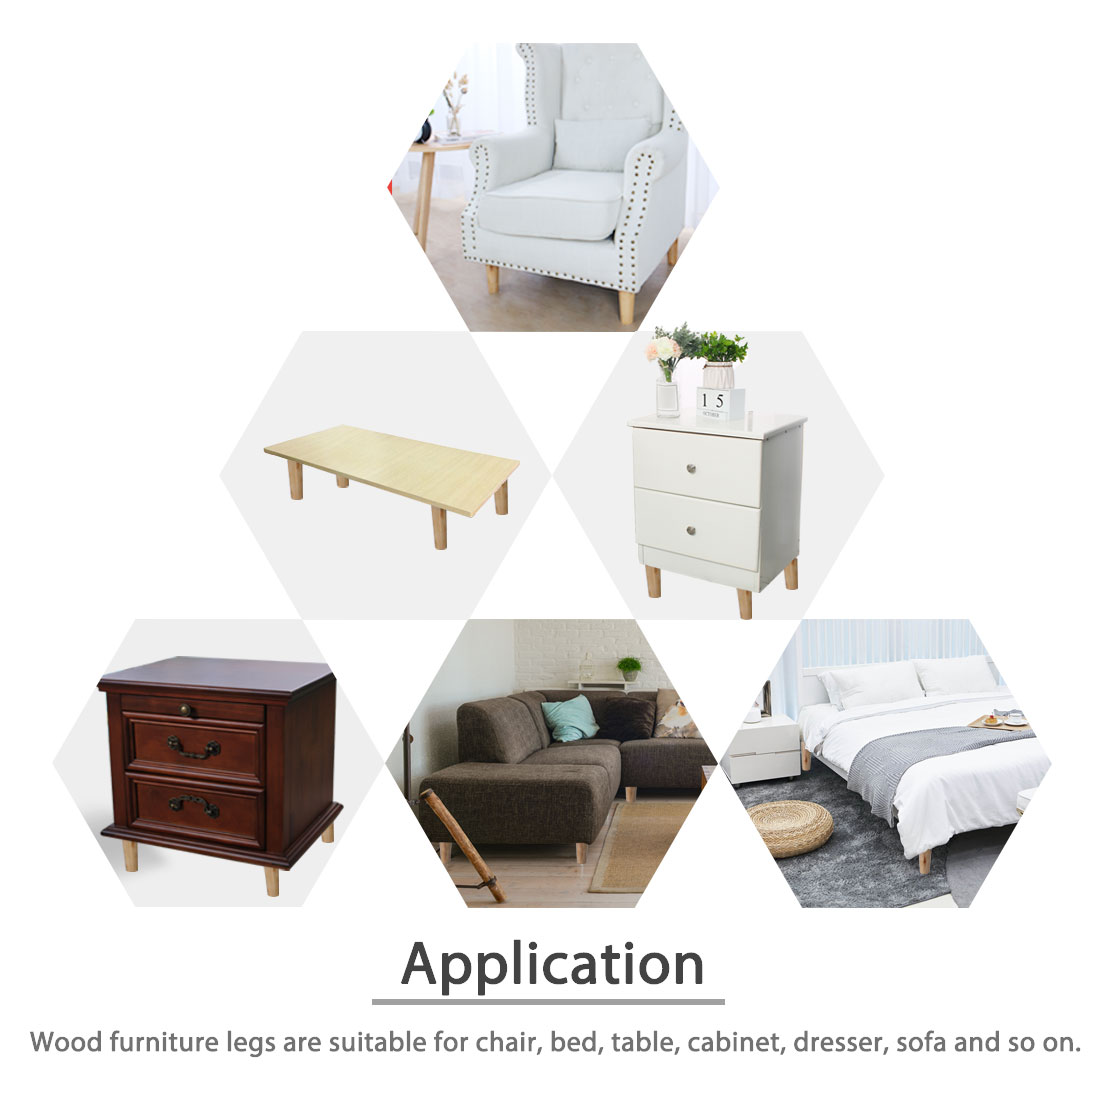 5 Inch Wood Furniture Leg Chair Sofa Table Oblique Feet Replacement, Wood Color - image 3 de 7